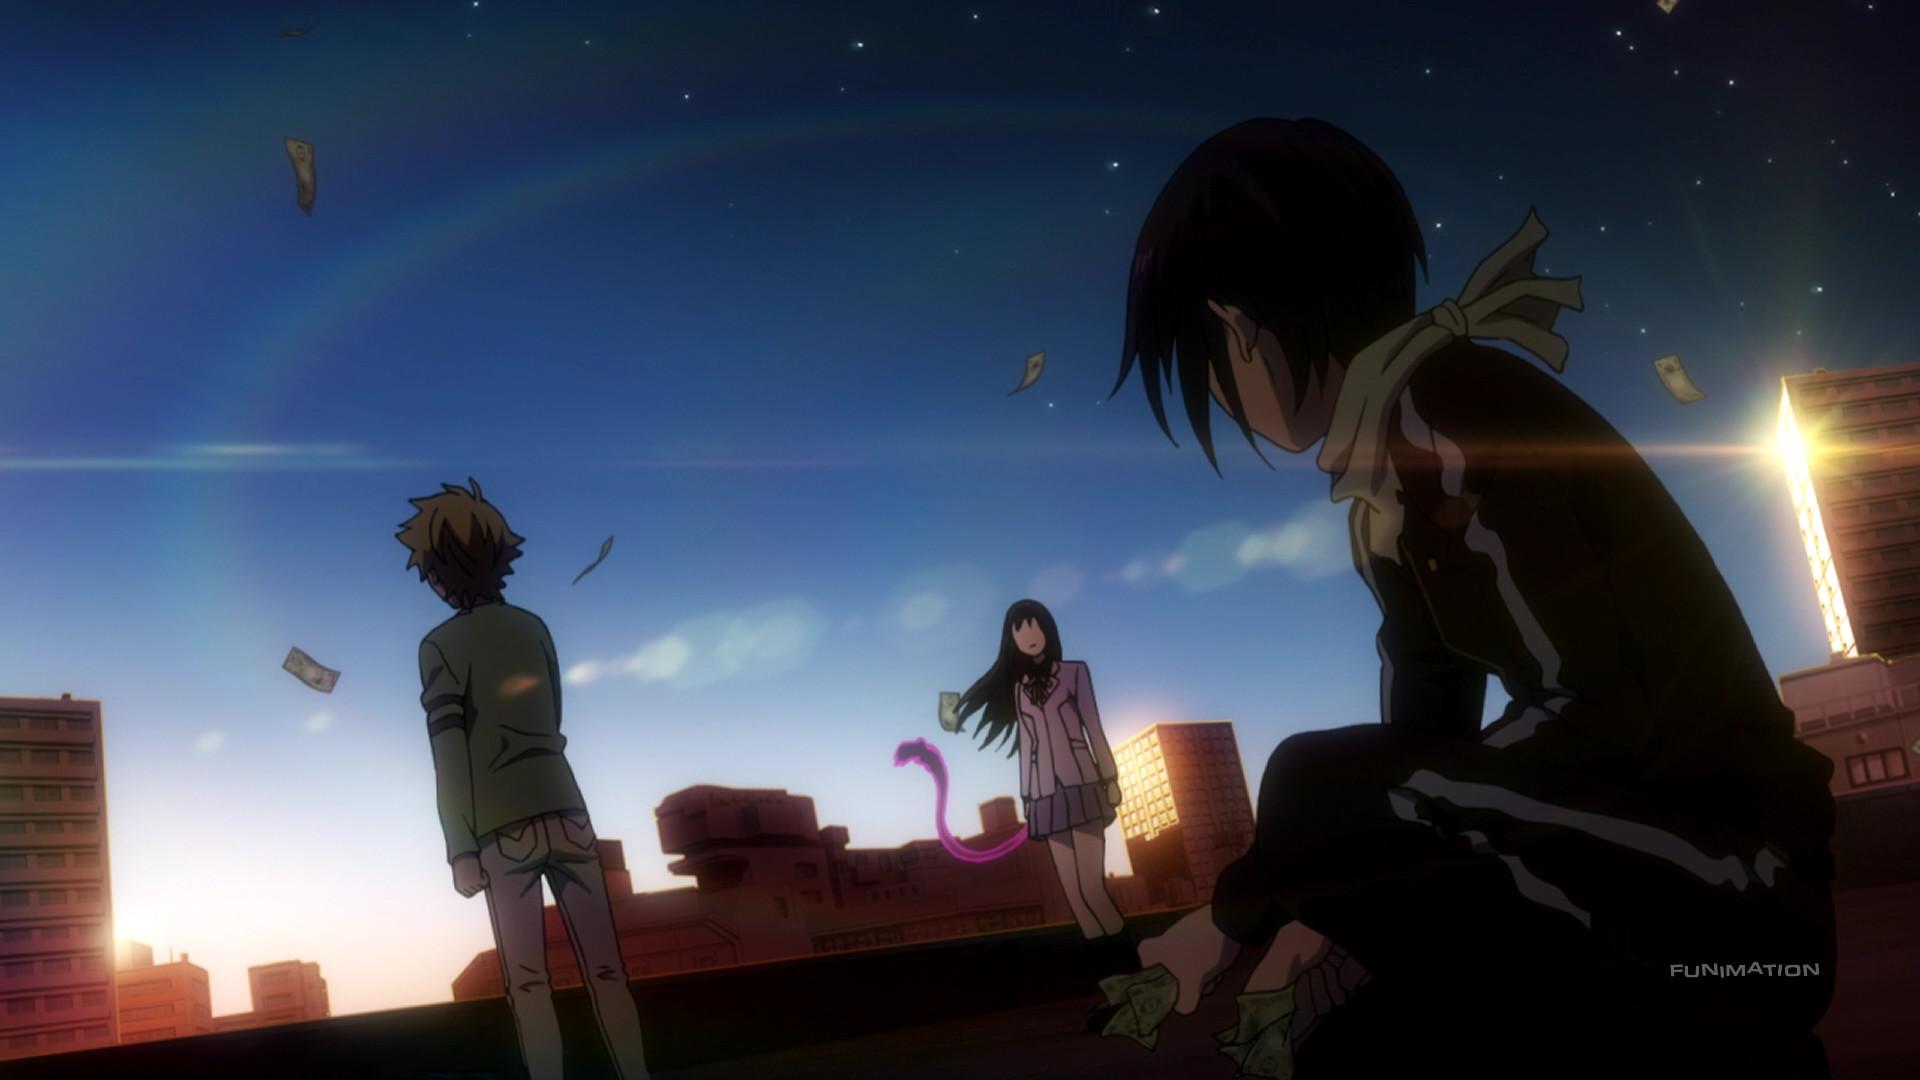 Noragami Aragoto / Episode 7 / Yato, Hiyori, and Yukine standing on a  rooftop